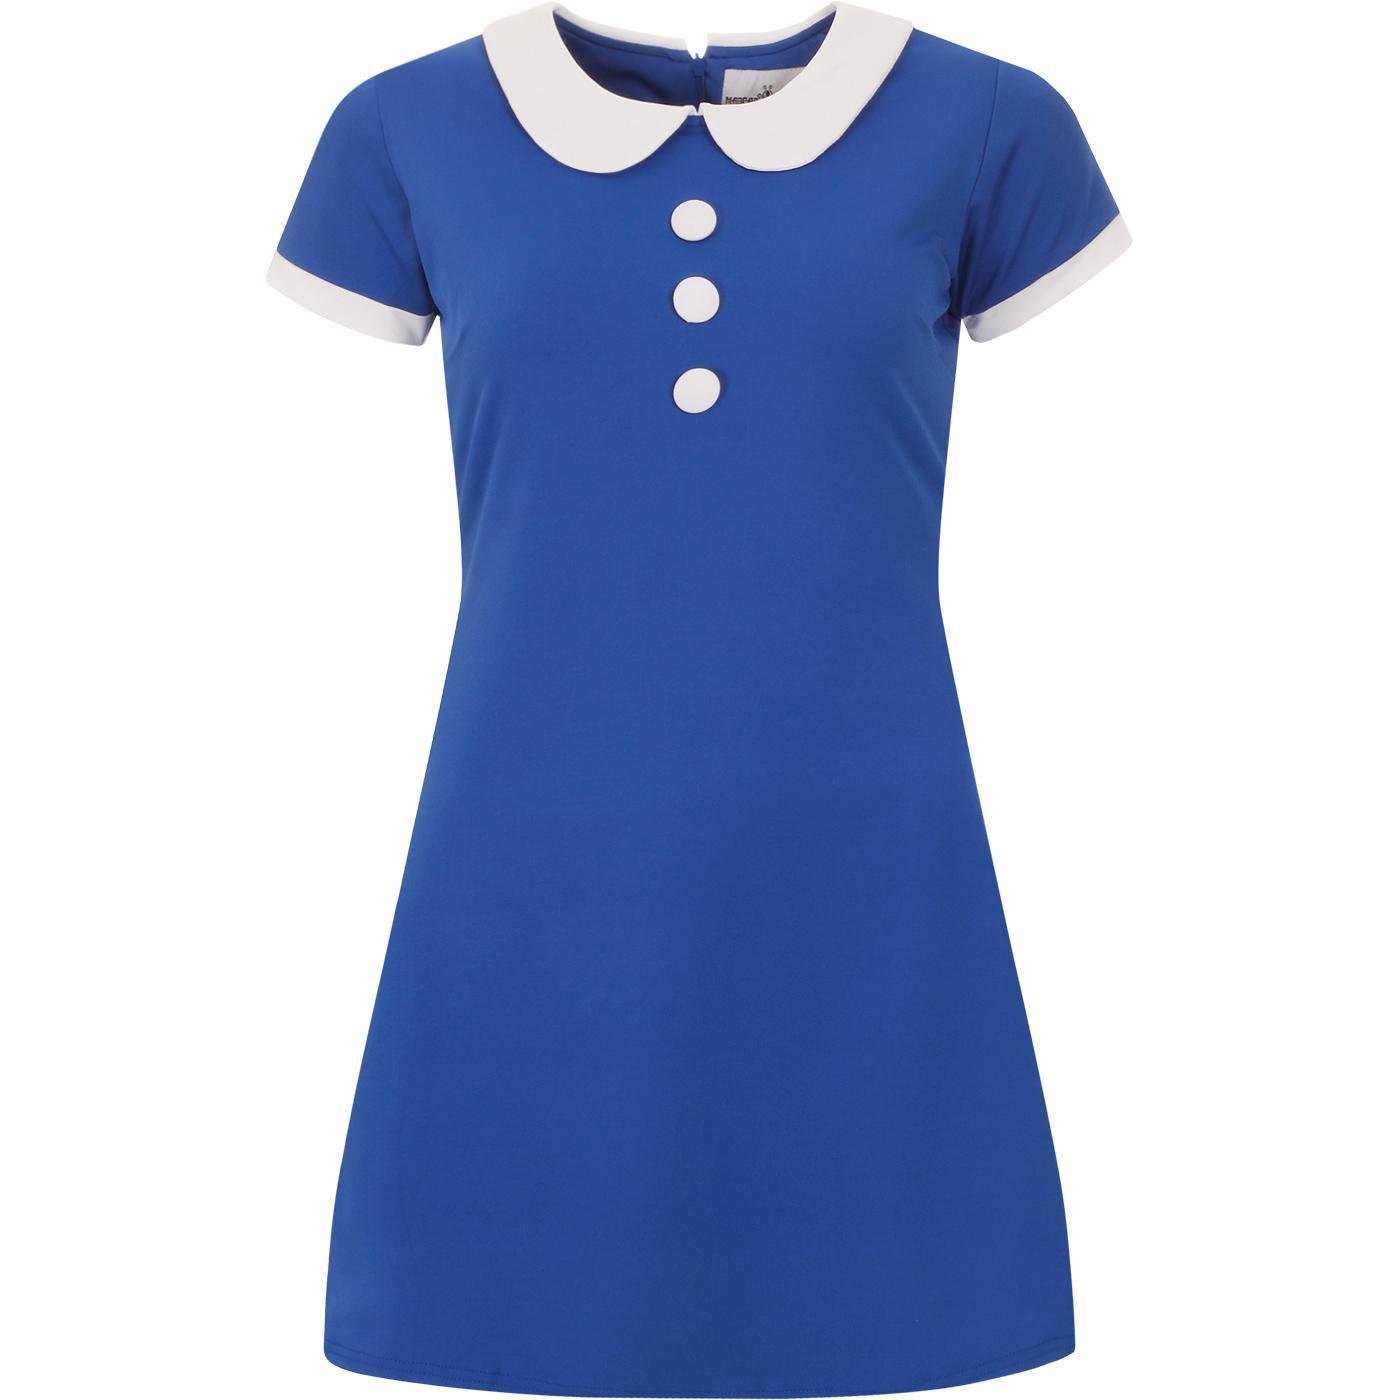 madcap england womens dollierocker 60s mod peter pan collar dress turkish sea blue white